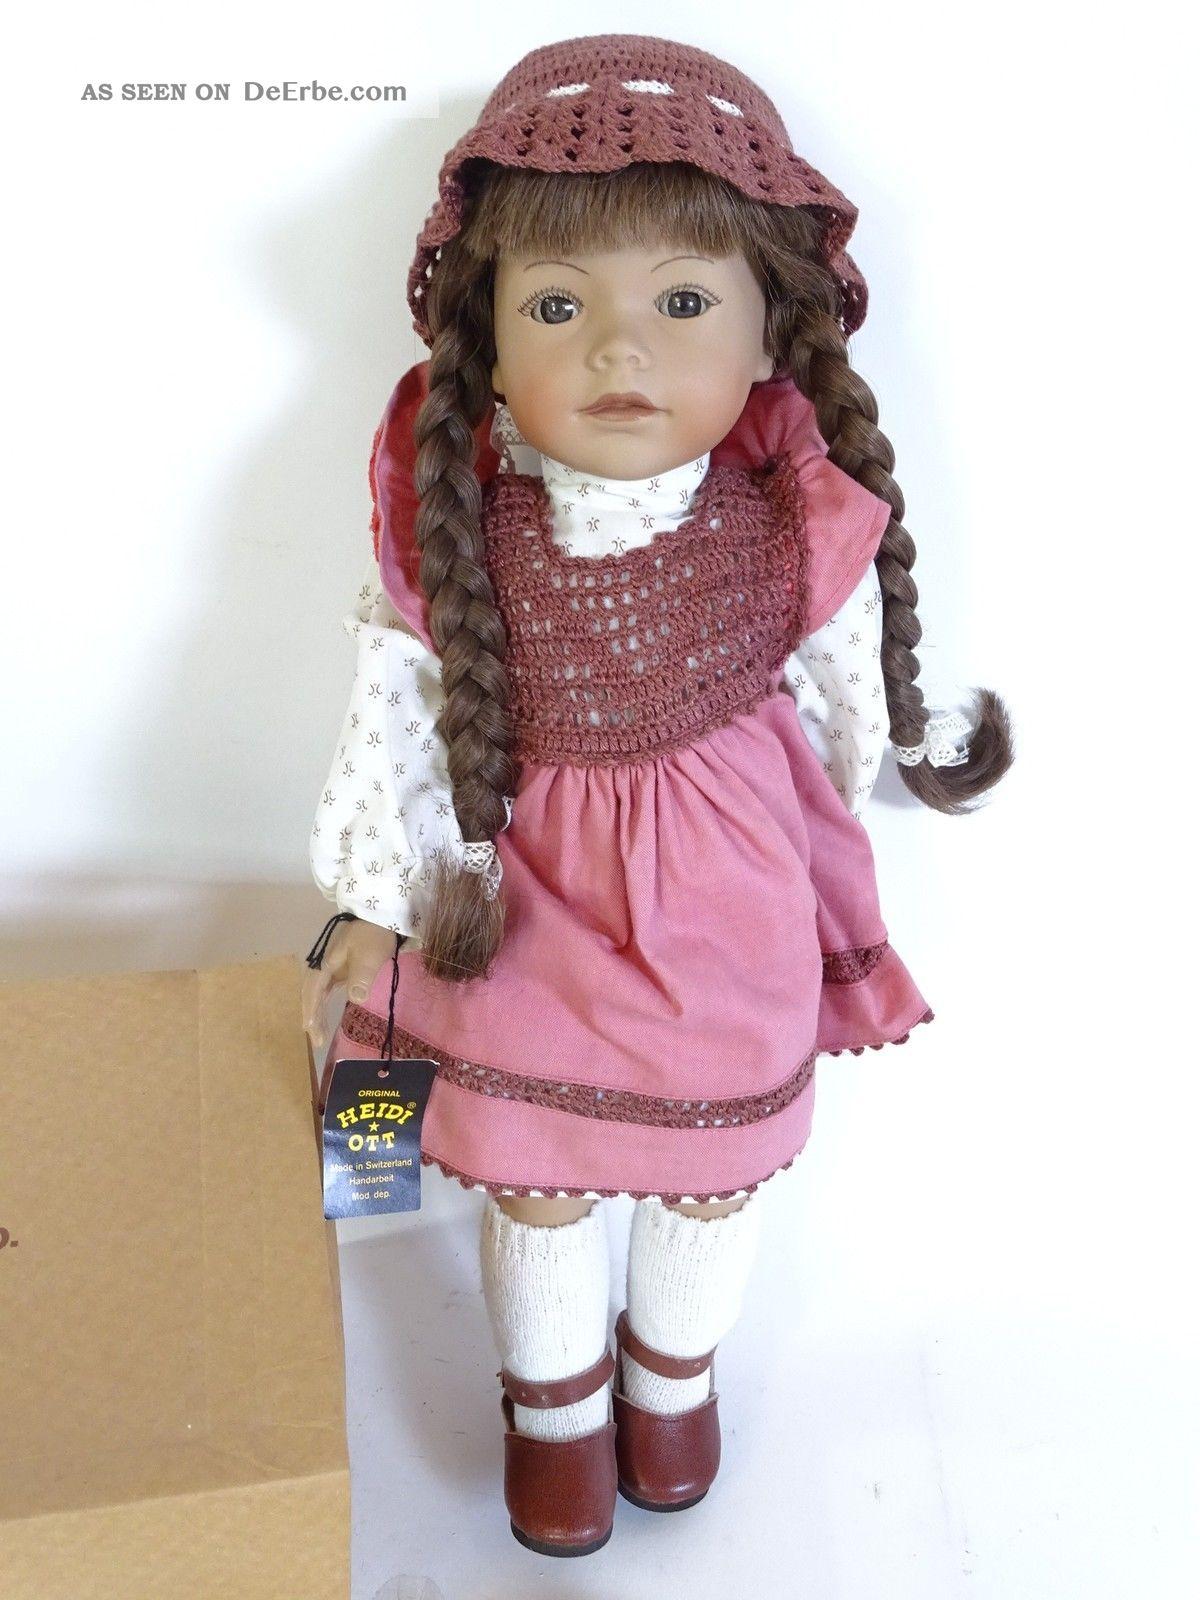 Signierte Heidi Ott Puppe Reg Nr.  72/89 Handbemalt Limitiert Zertifikat Porzellankopfpuppen Bild